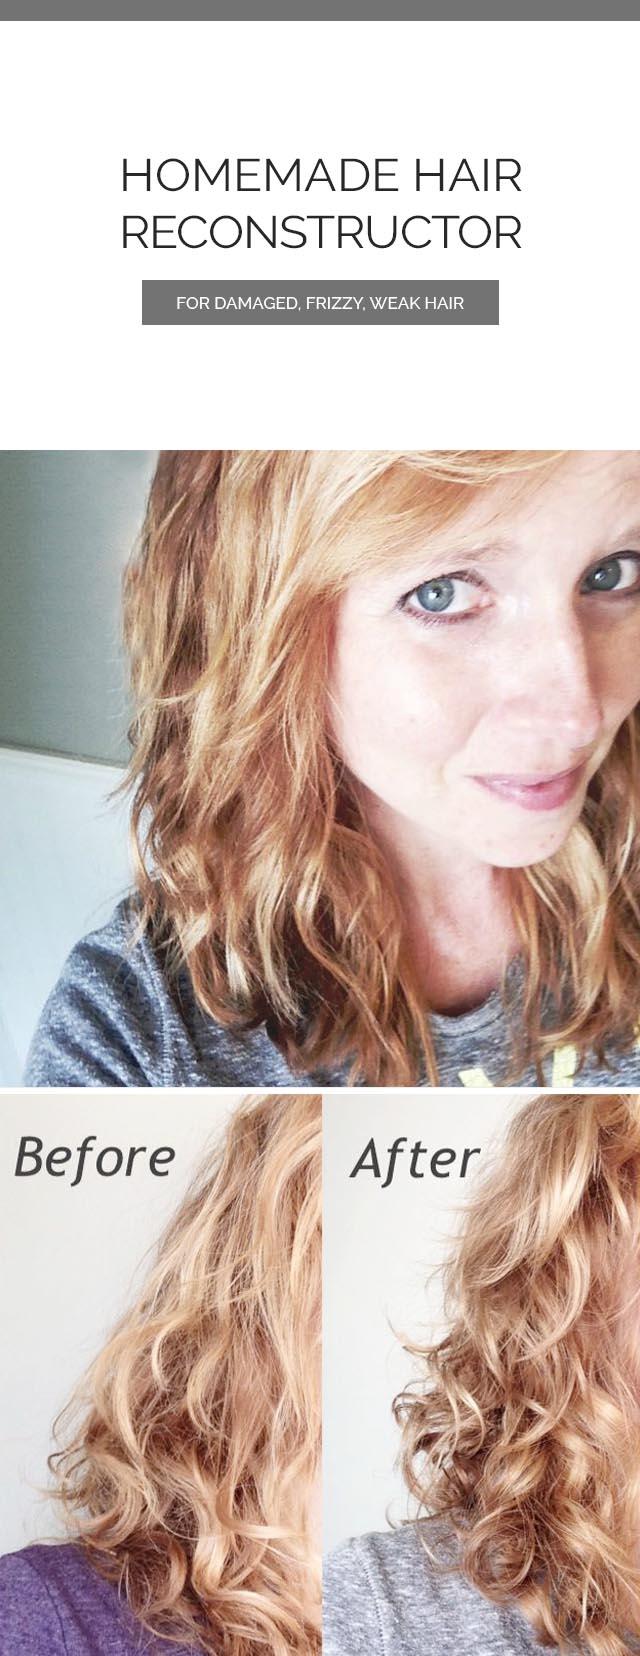 DIY Homemade Hair Reconstructor